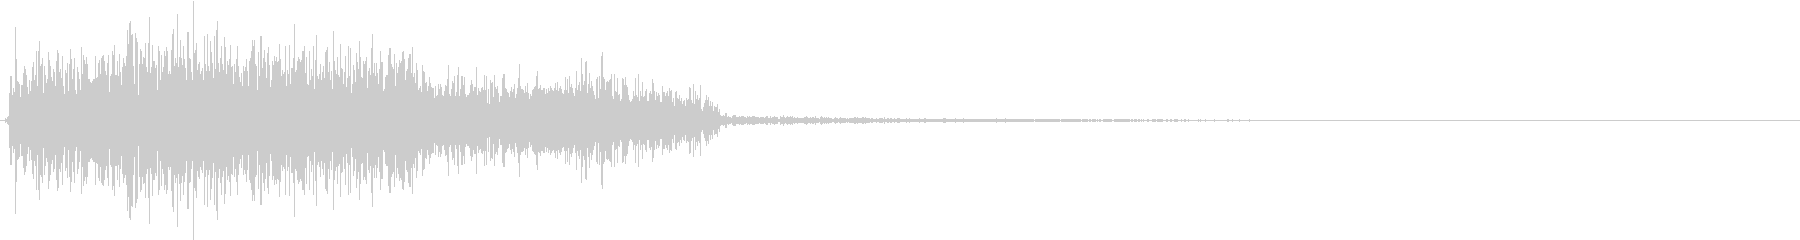 SciFi EC01_91_2の未再生の波形